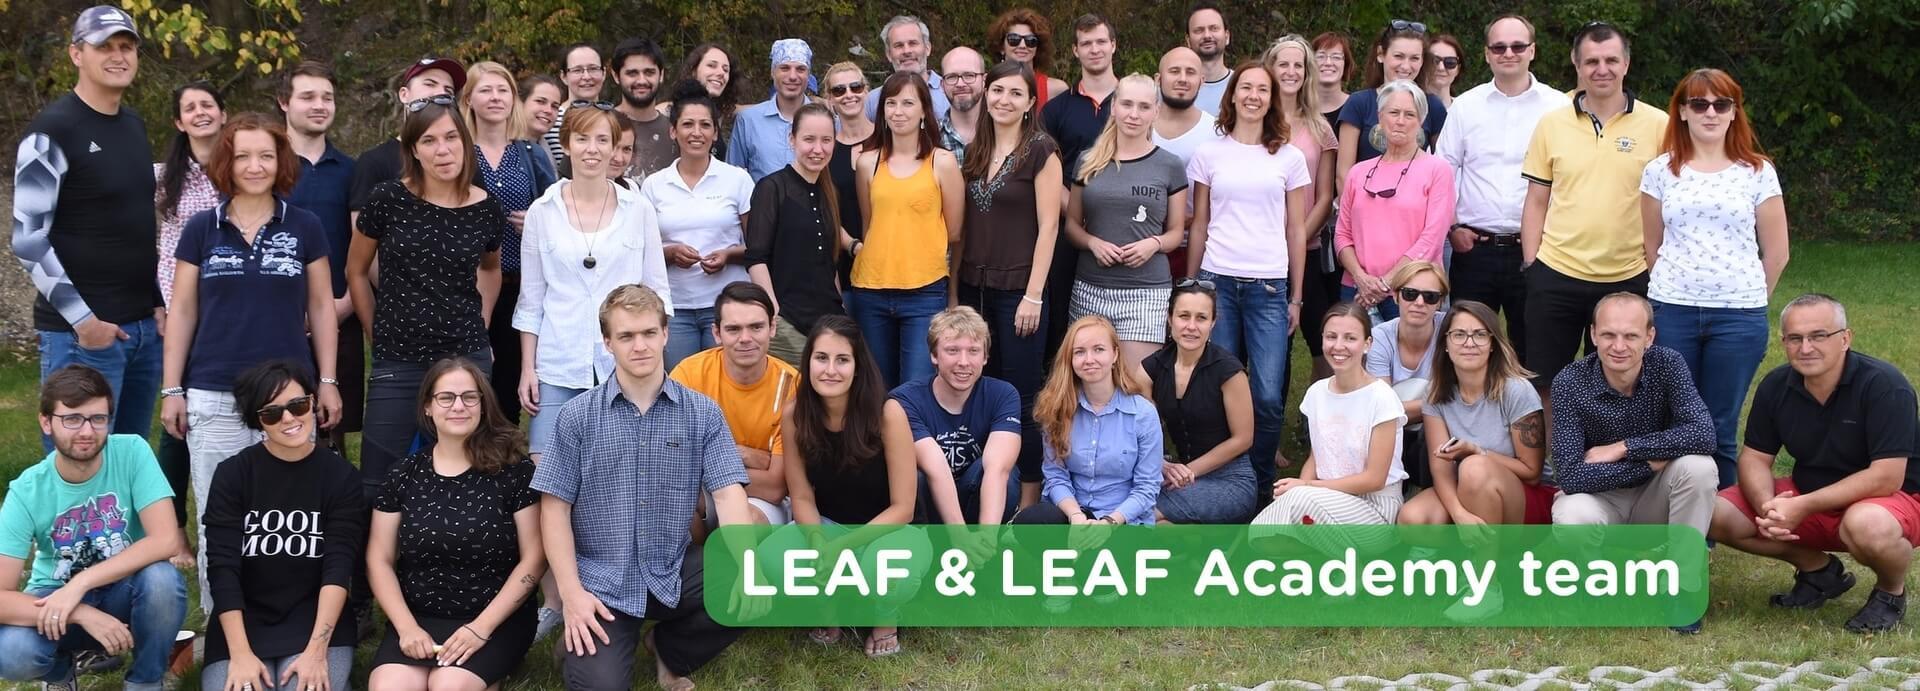 leaf-kariera-outro-bg